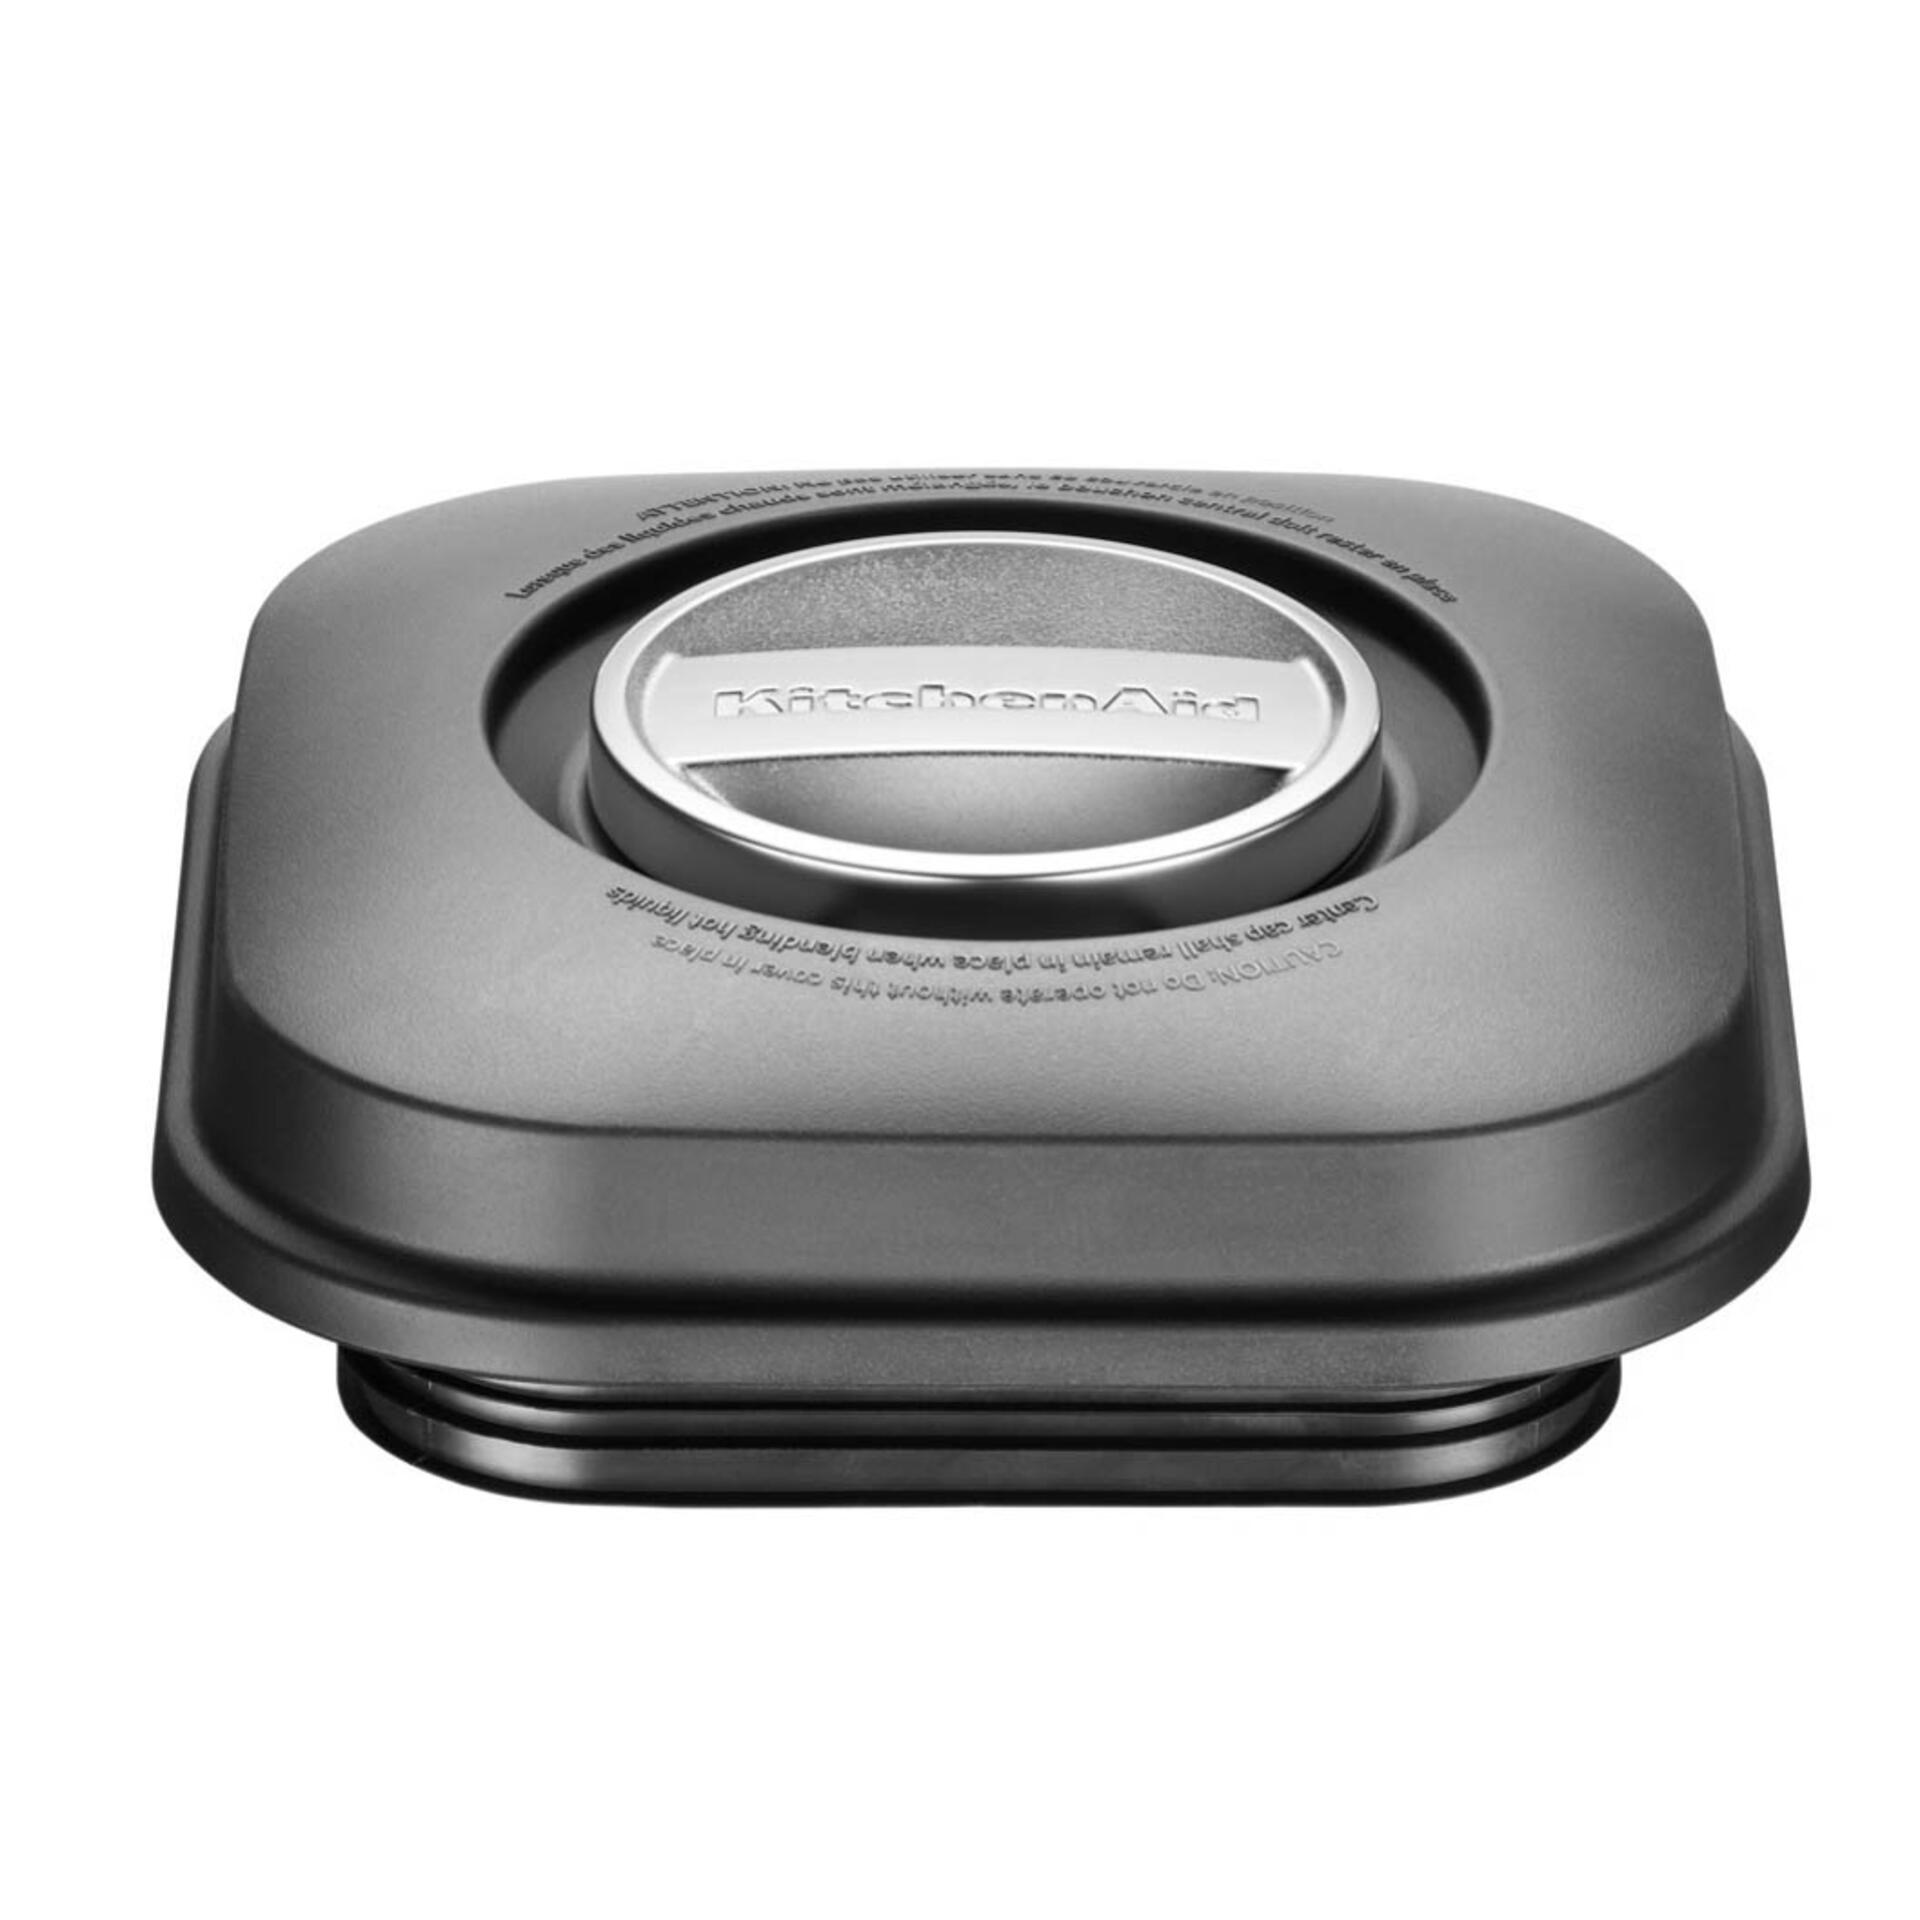 Kitchenaid Artisan Power Plus Blender Standmixer 5KSB8270 Liebesapfel Rot